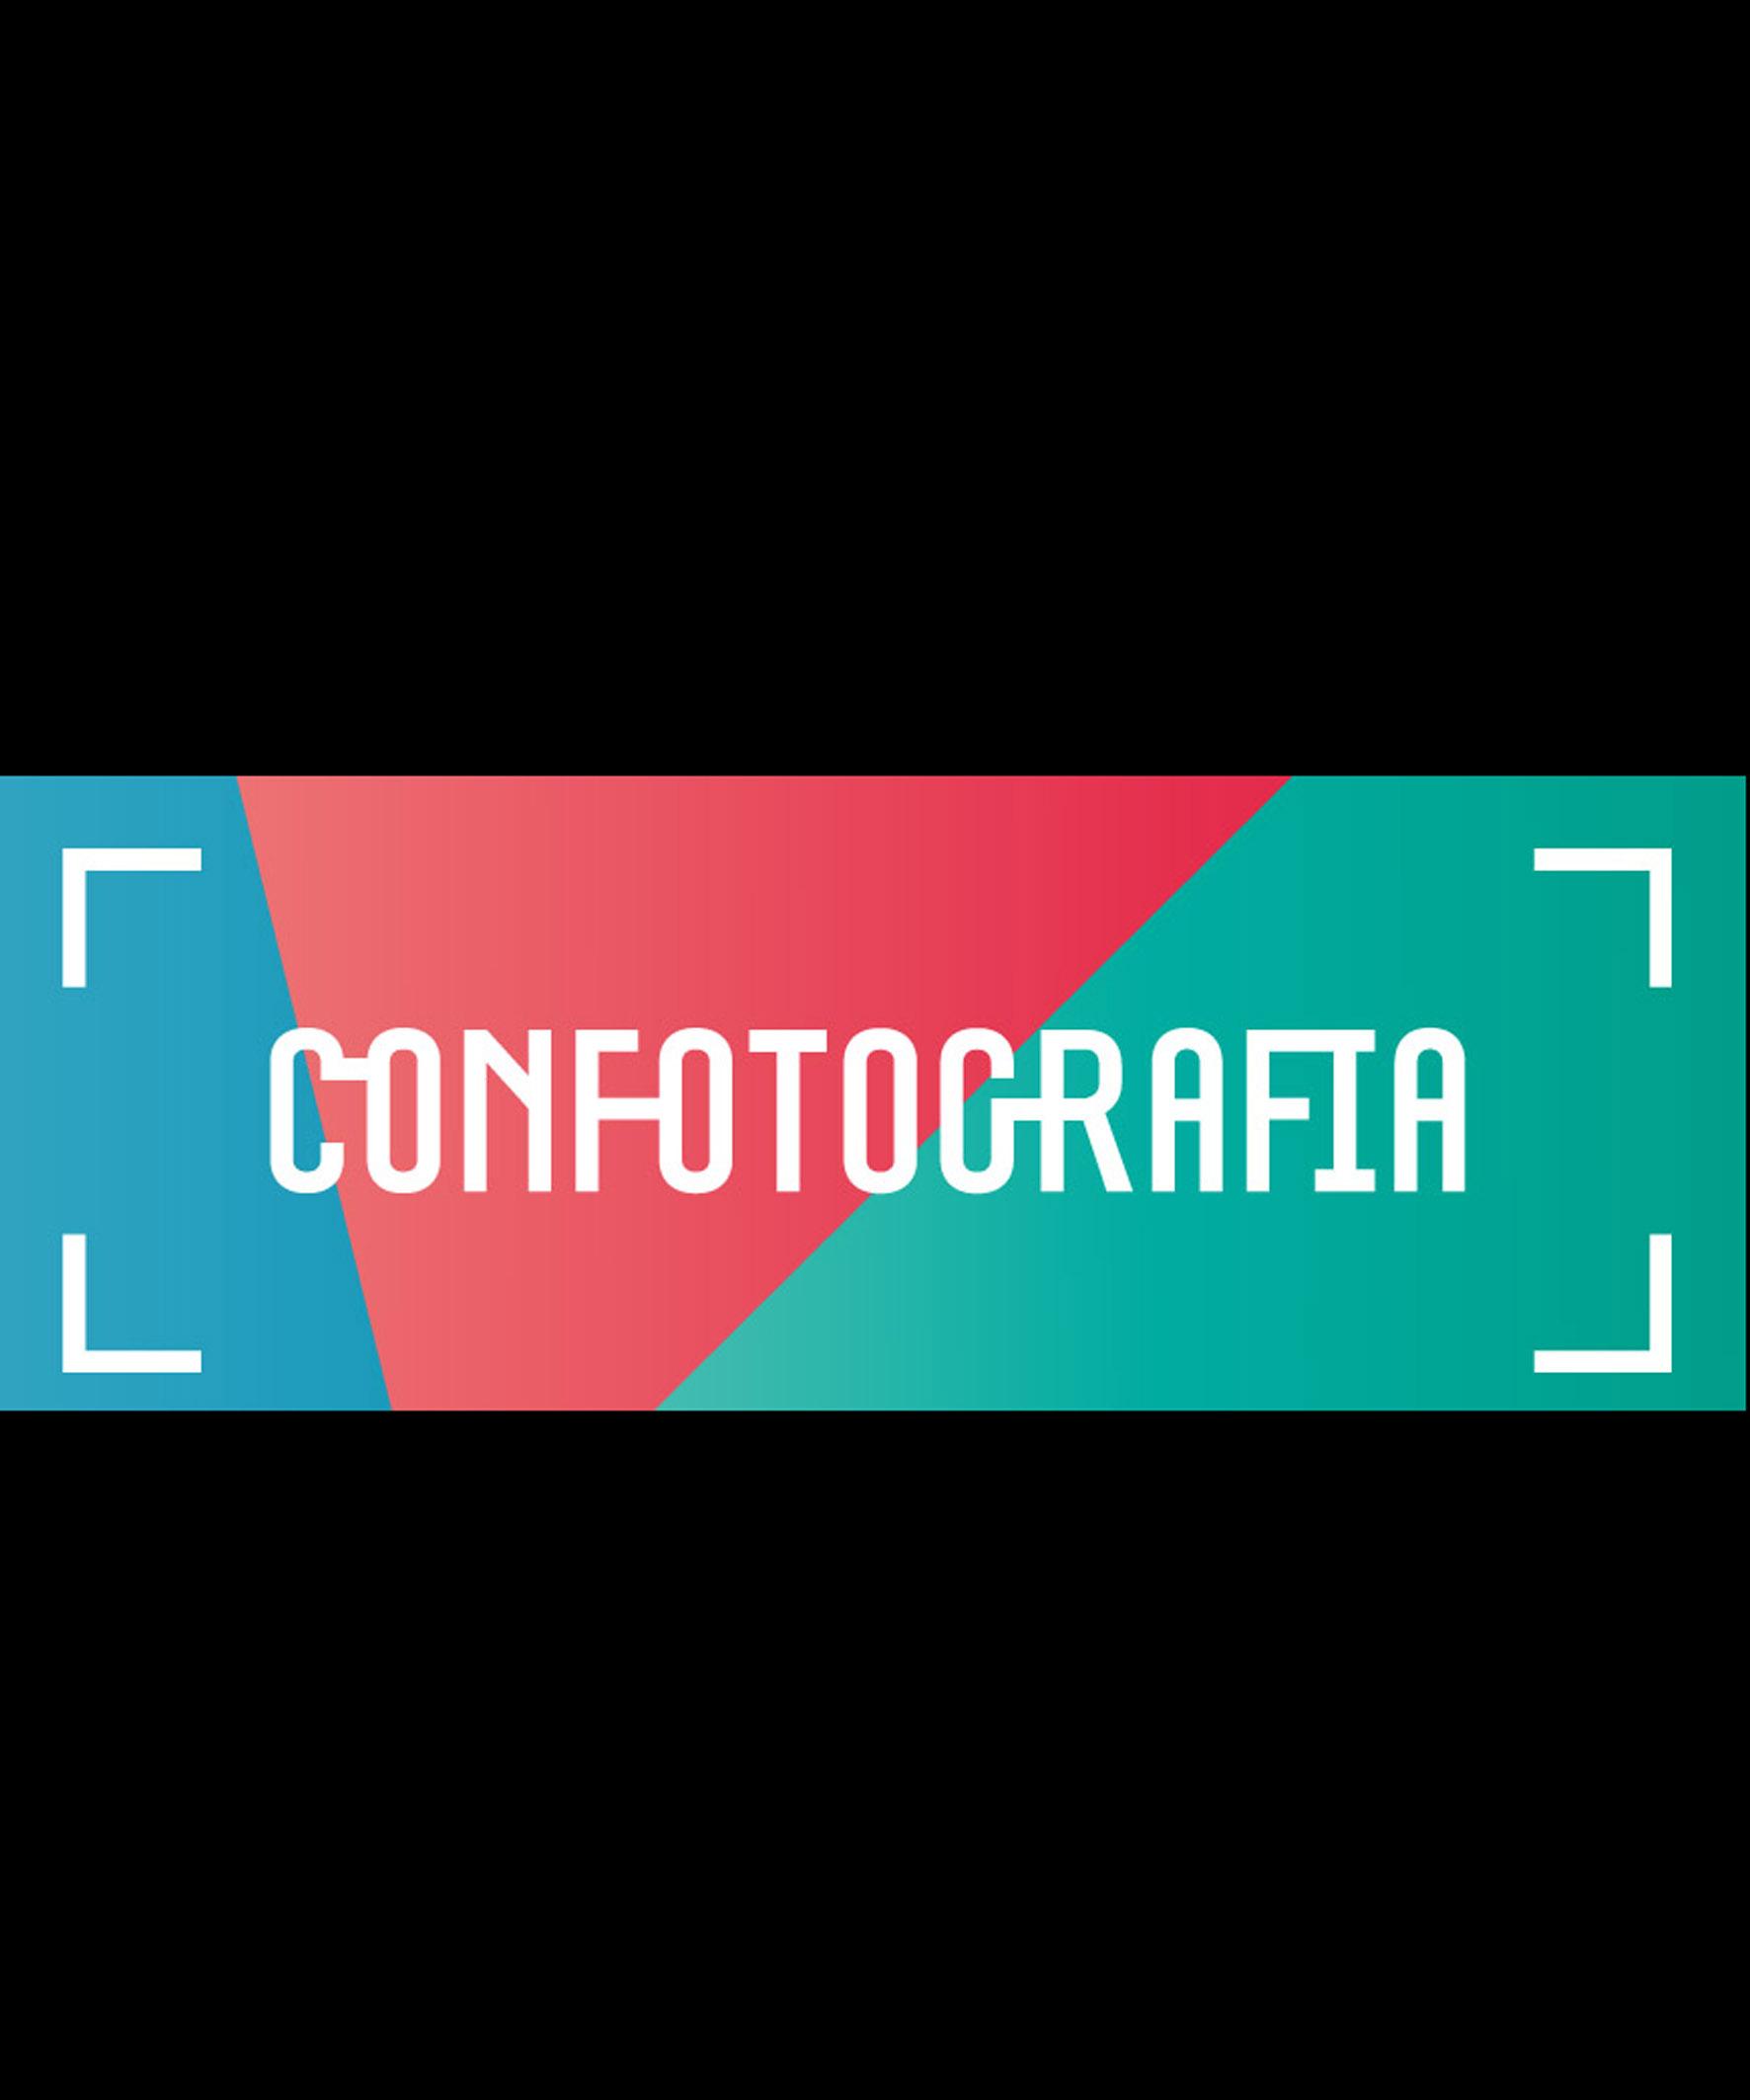 CONFOTOGRAFIA